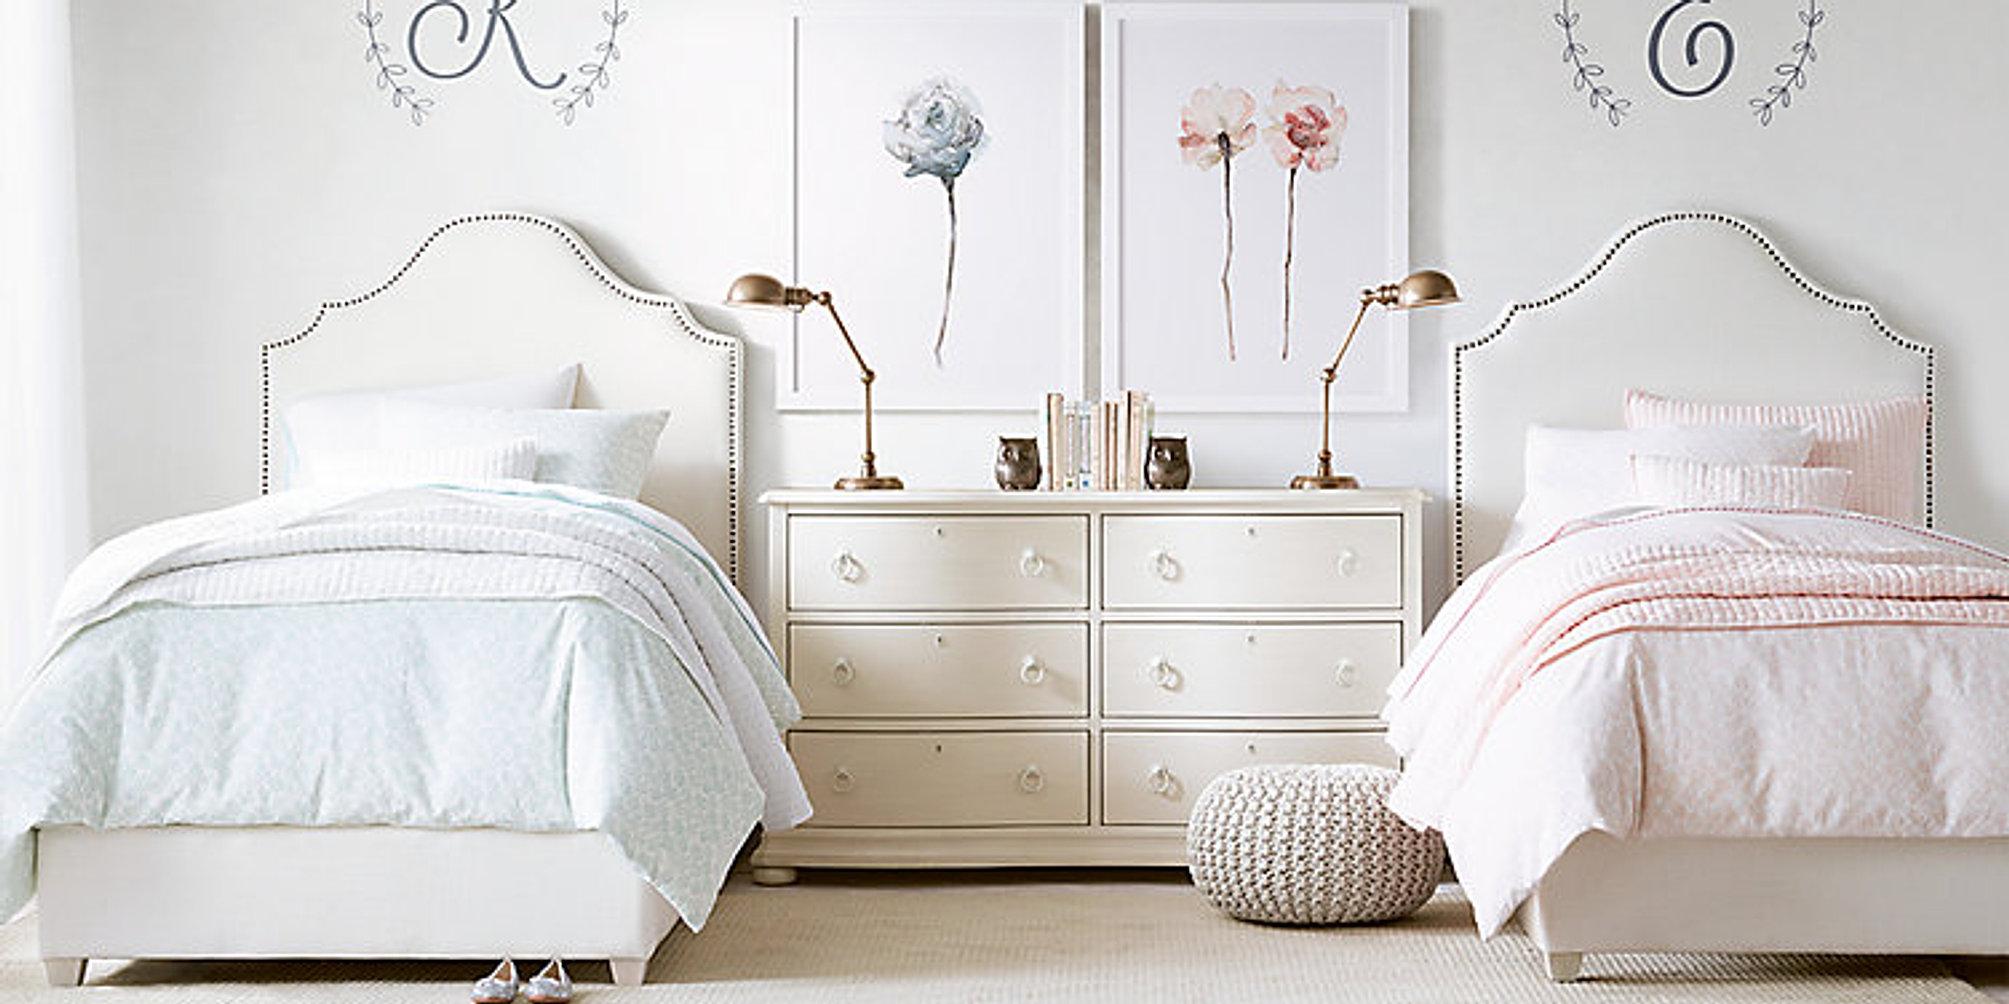 Dormitoros juveniles e infantiles con encanto - Muebles con encanto online ...